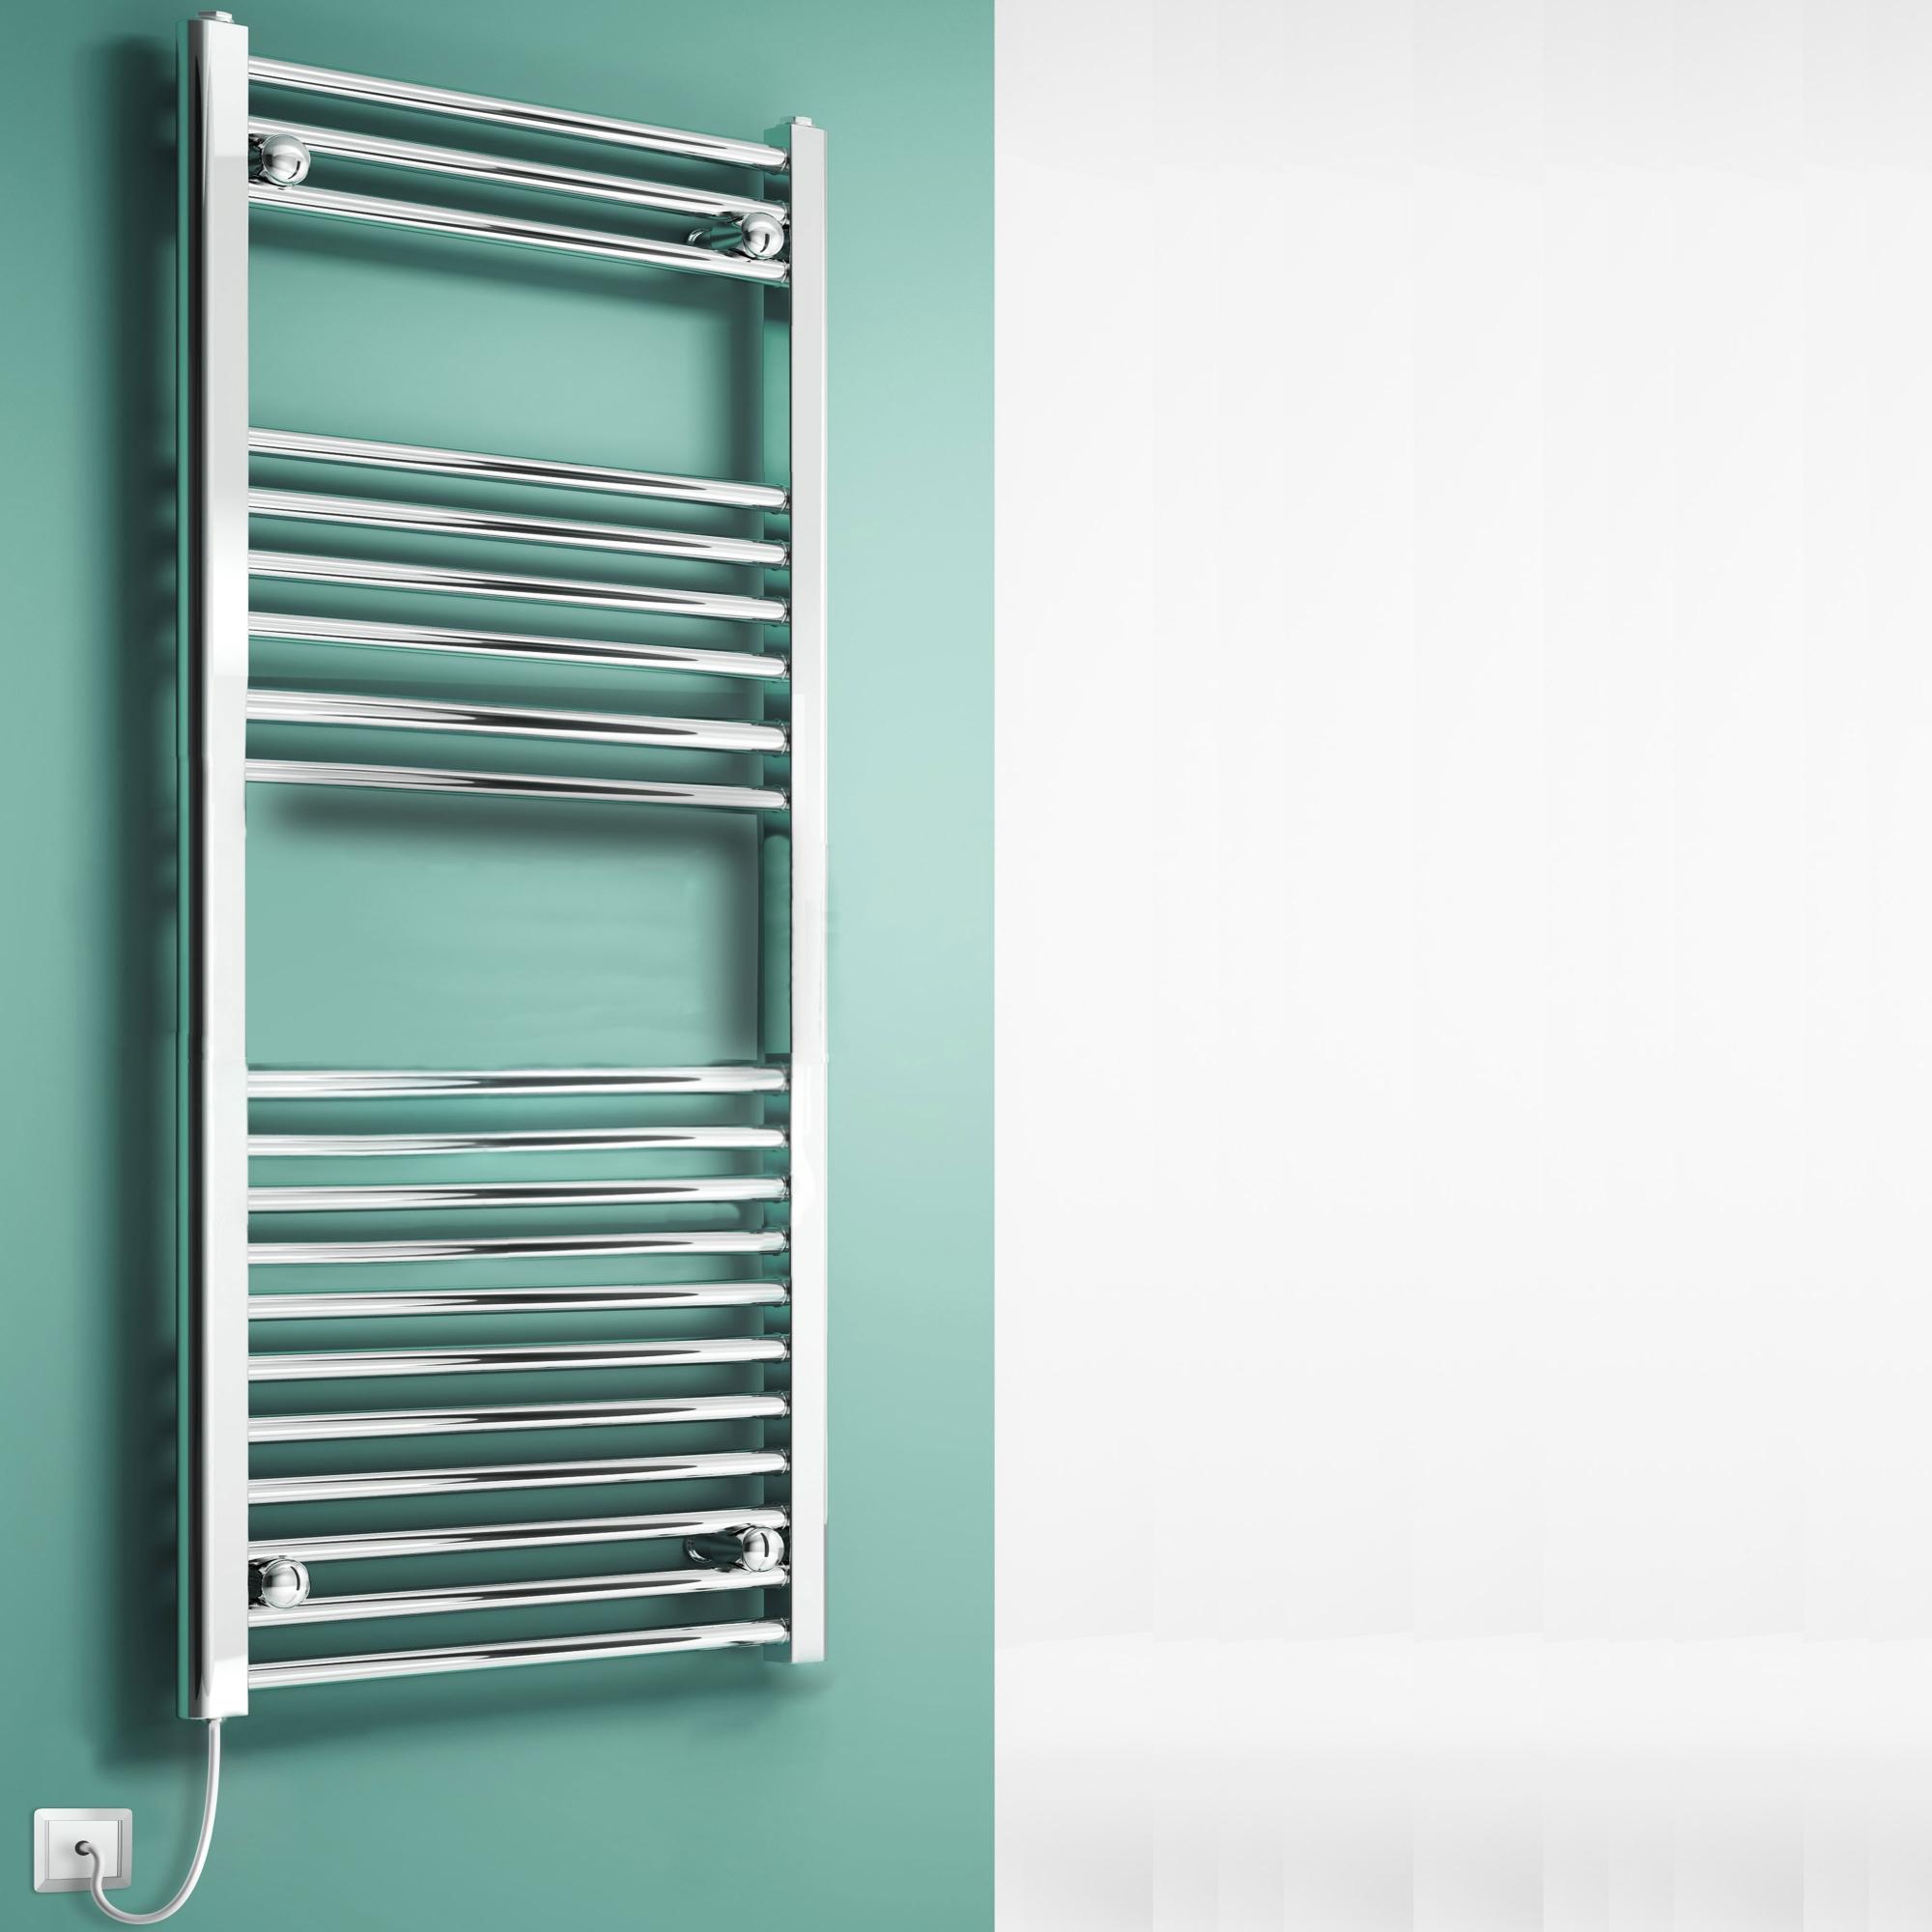 Reina Eross Dry Electric Heated Towel Rail 750mm H x 300mm W